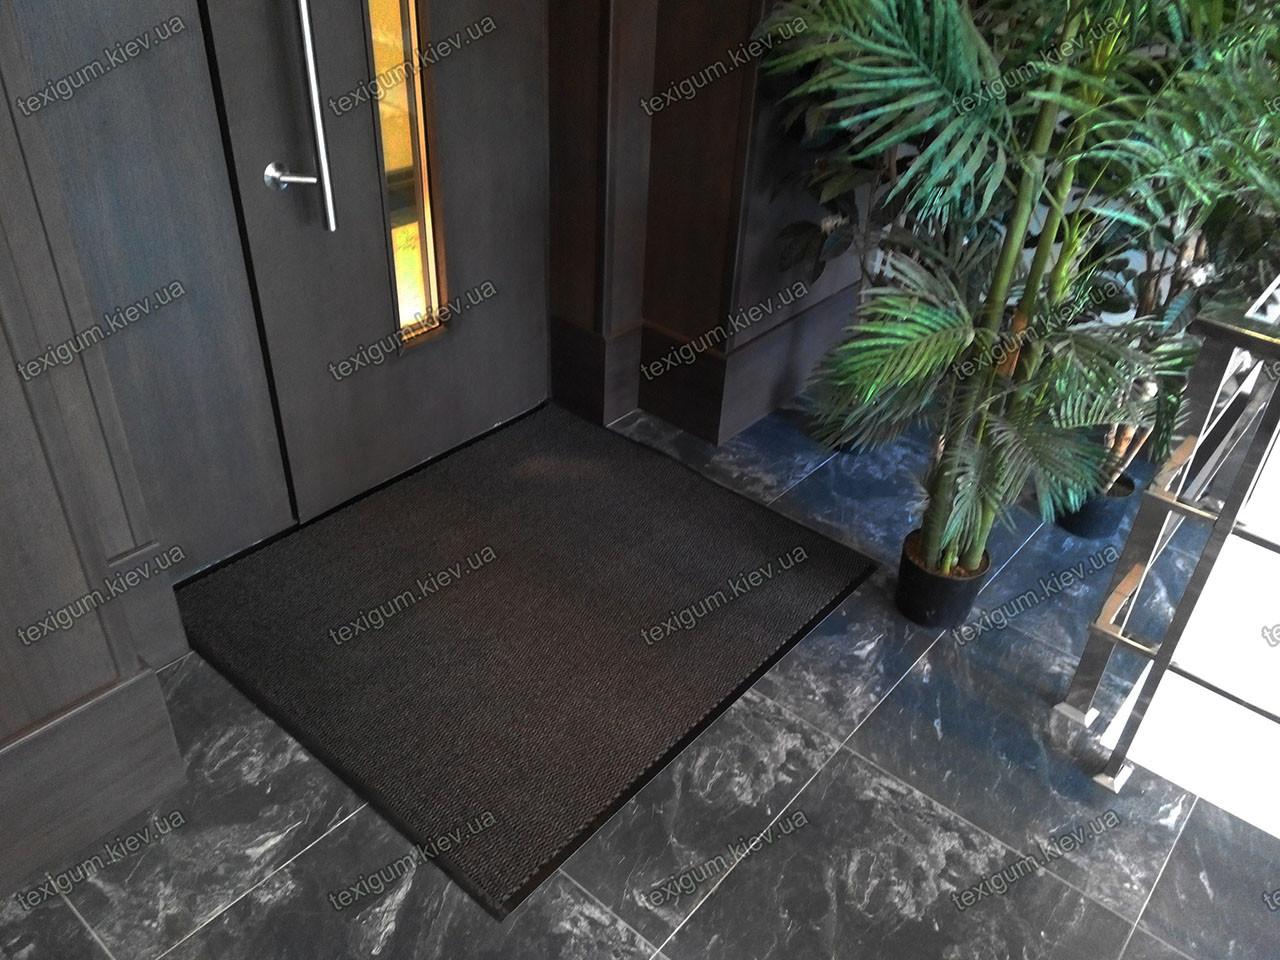 Грязезащитный ковер Стандарт темно-серый 90х120см